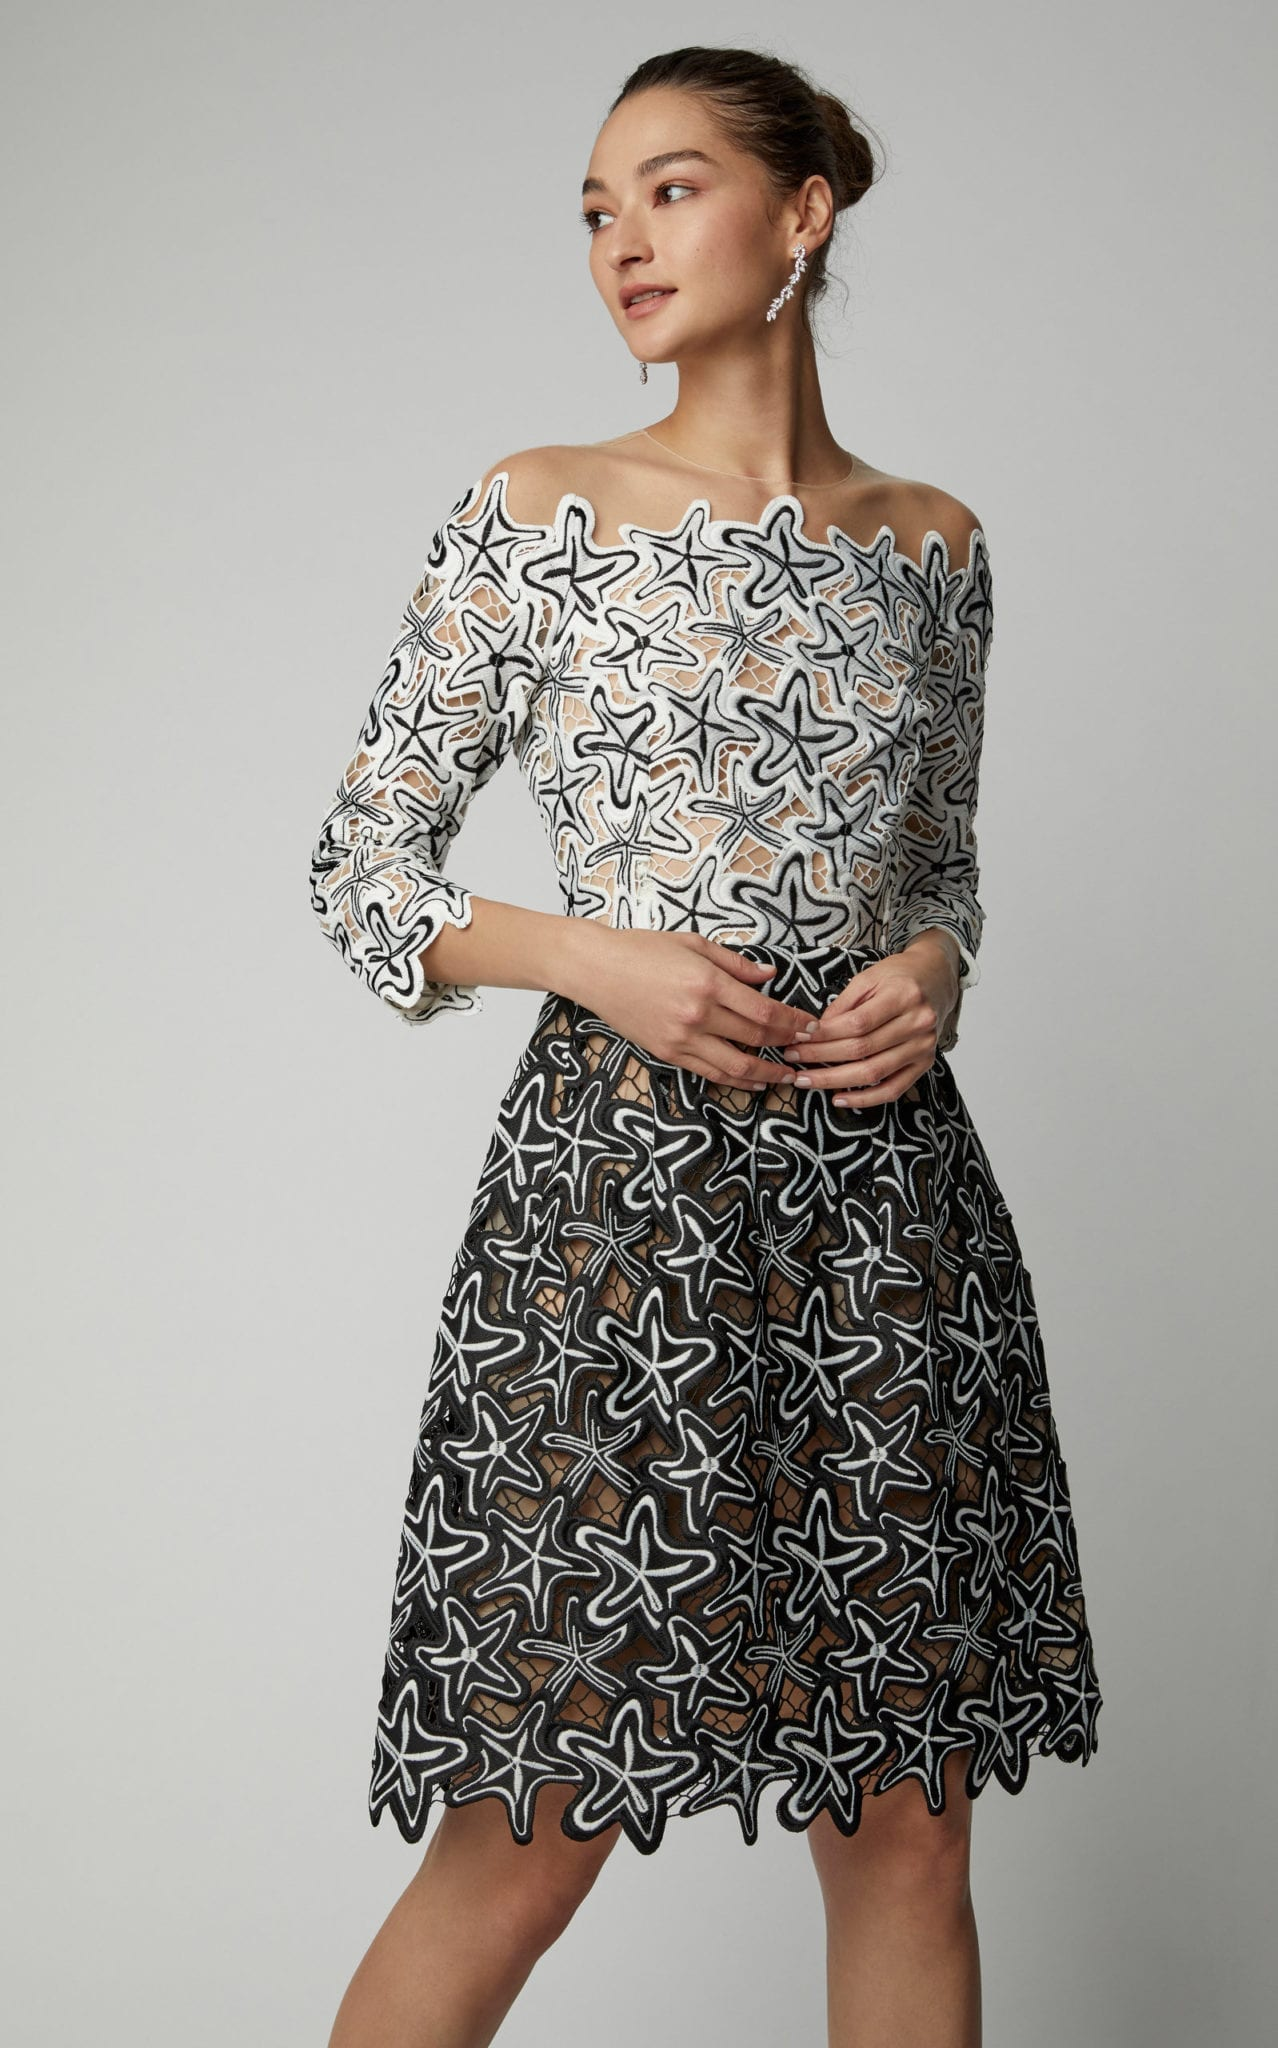 OSCAR DE LA RENTA Illusion Guipure Lace Midi Black Multi Dress